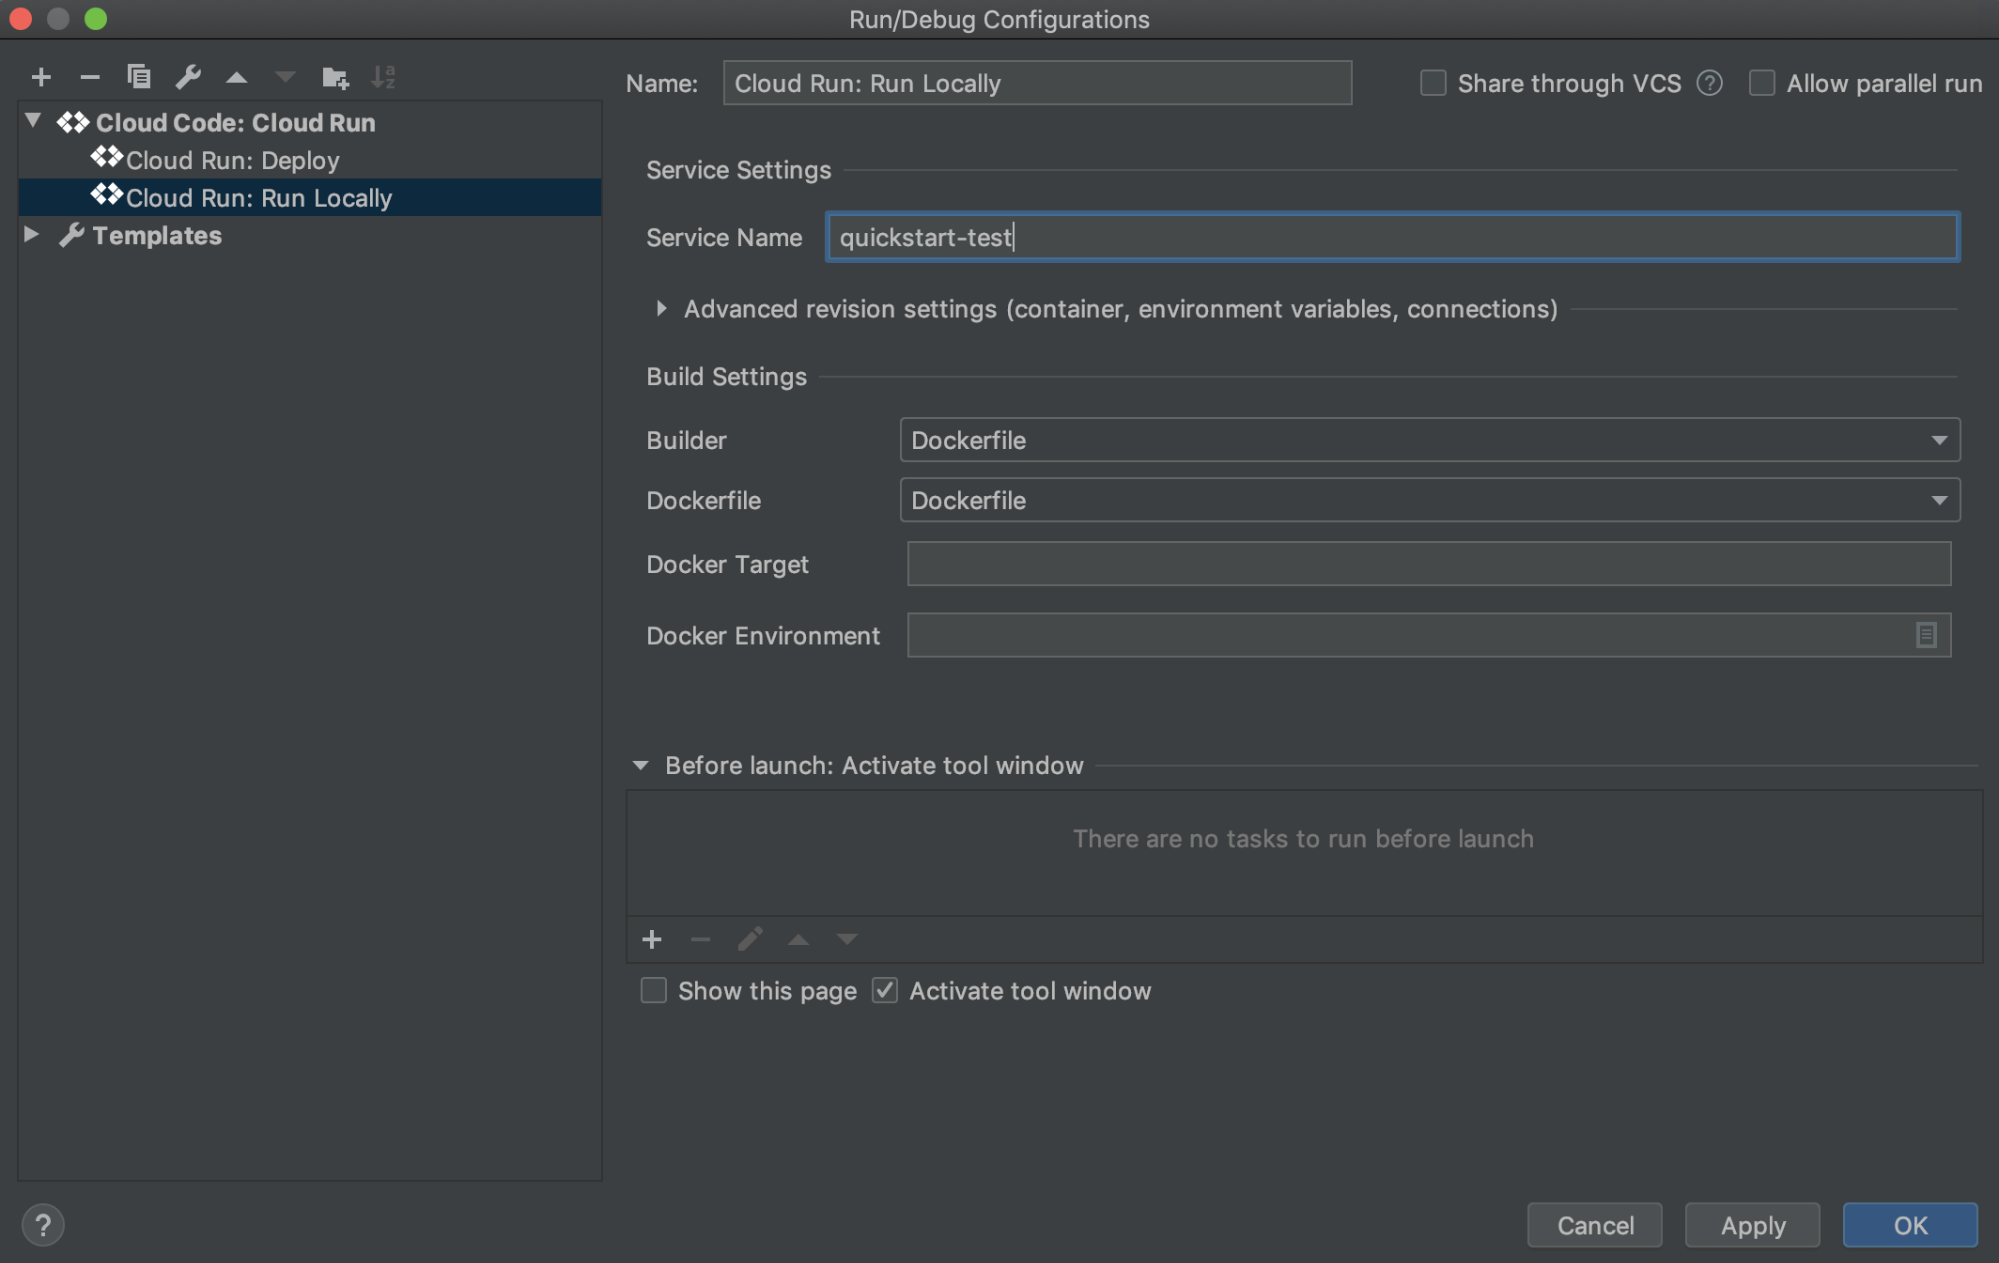 Cloud Run: Lokales Konfigurationsfenster ausführen